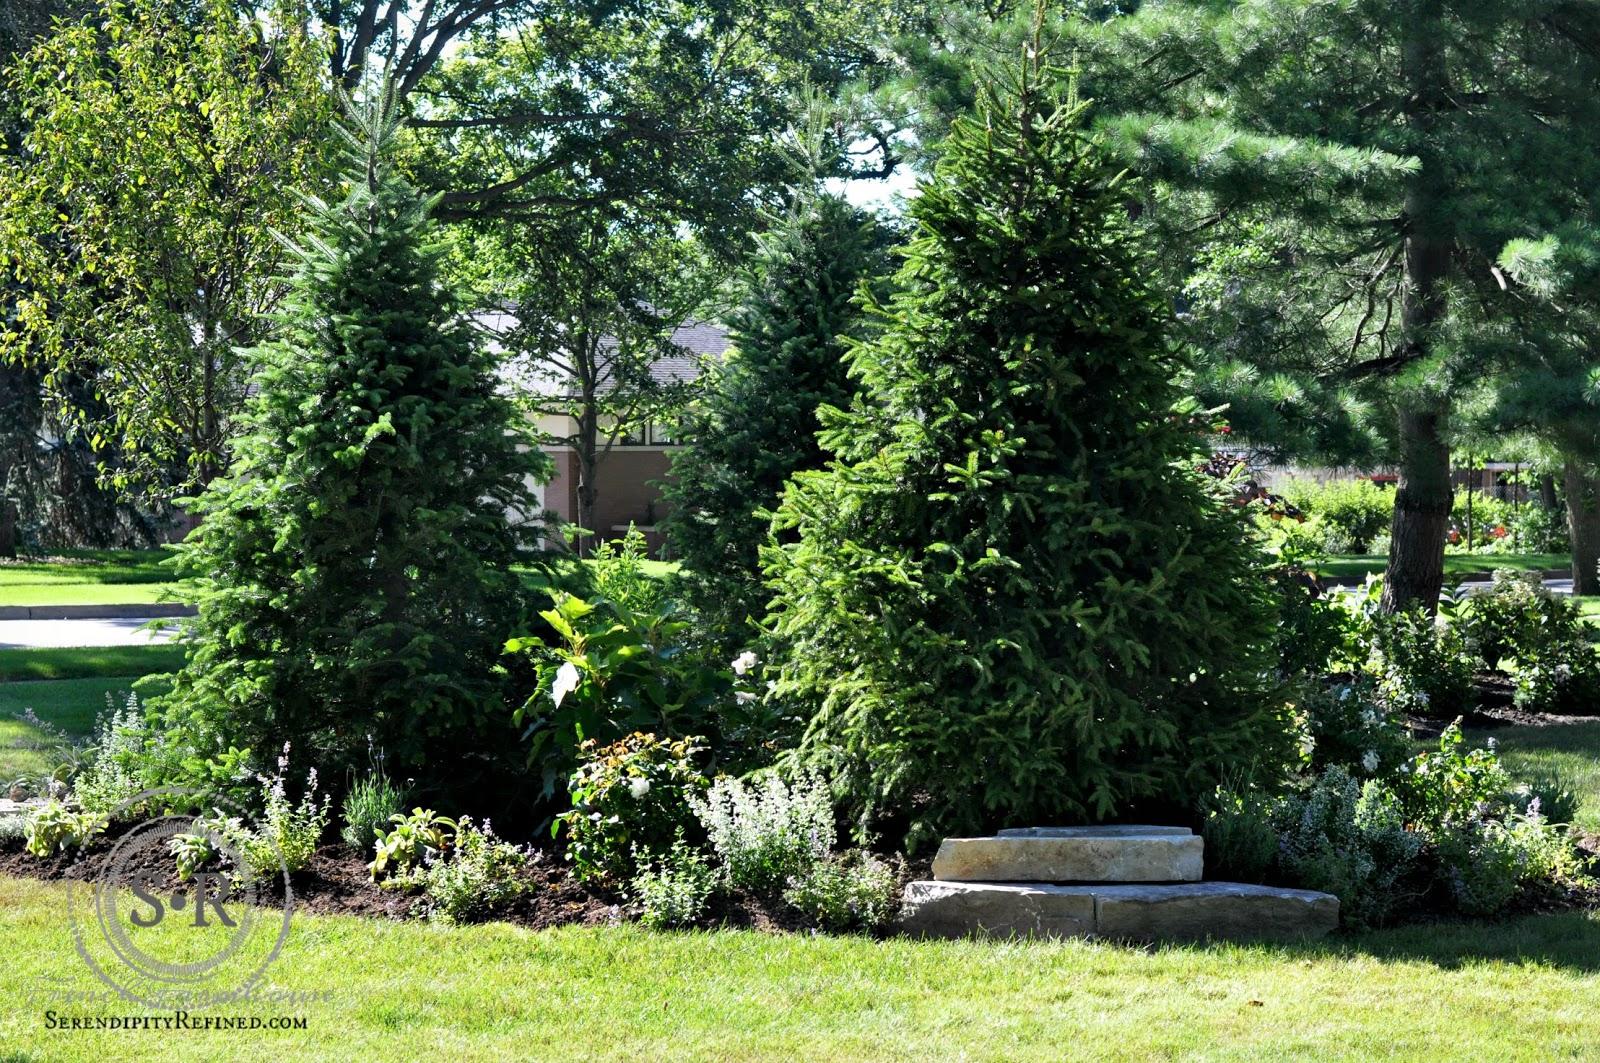 Serendipity refined blog how to landscape a corner lot for Landscape design for privacy